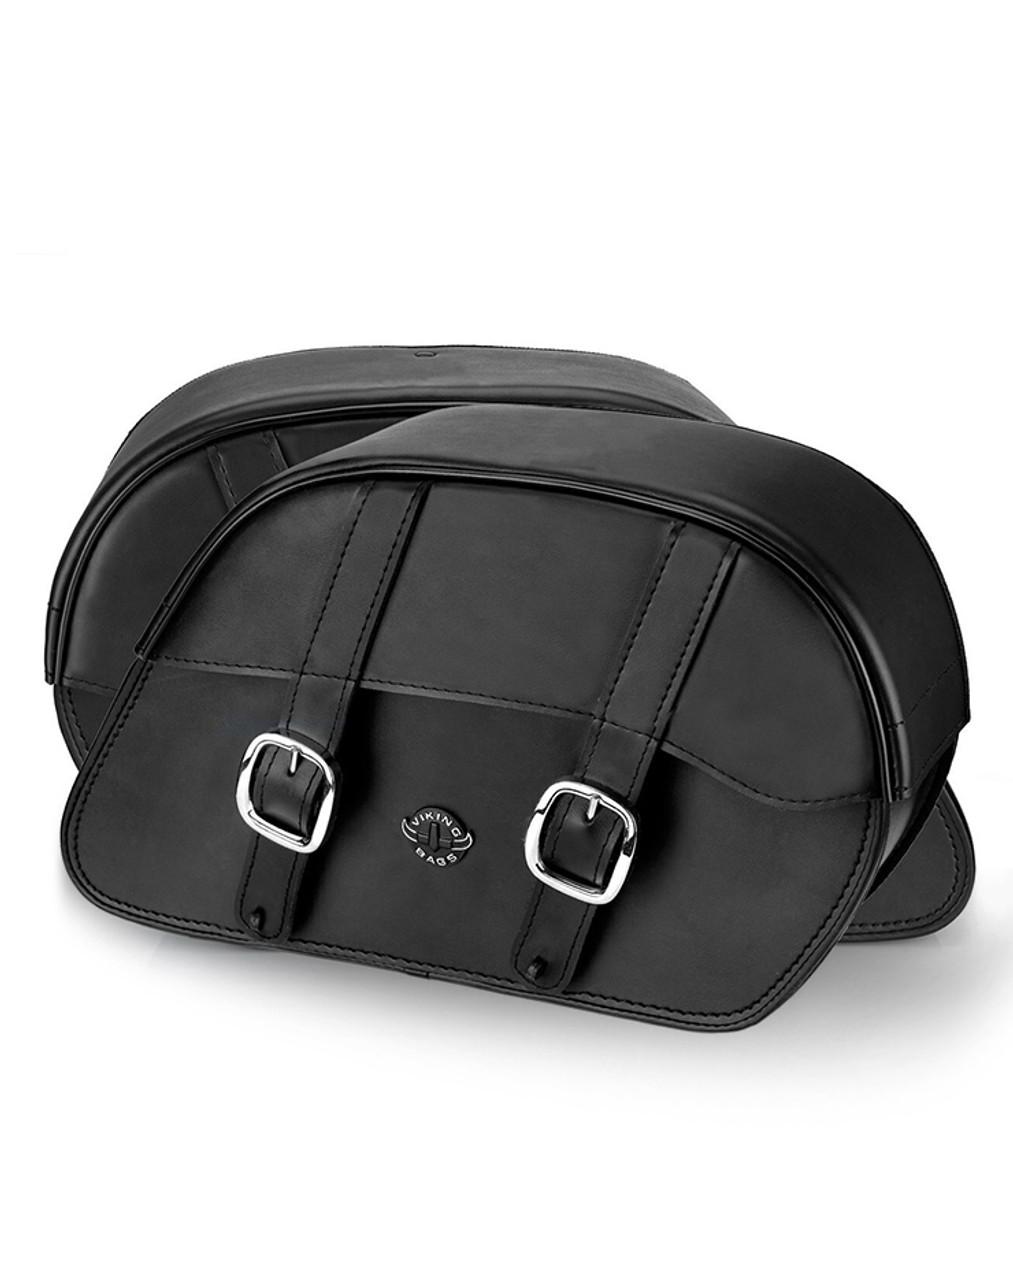 Yamaha V Star 950 Medium Slanted Motorcycle Saddlebags Both Bags View